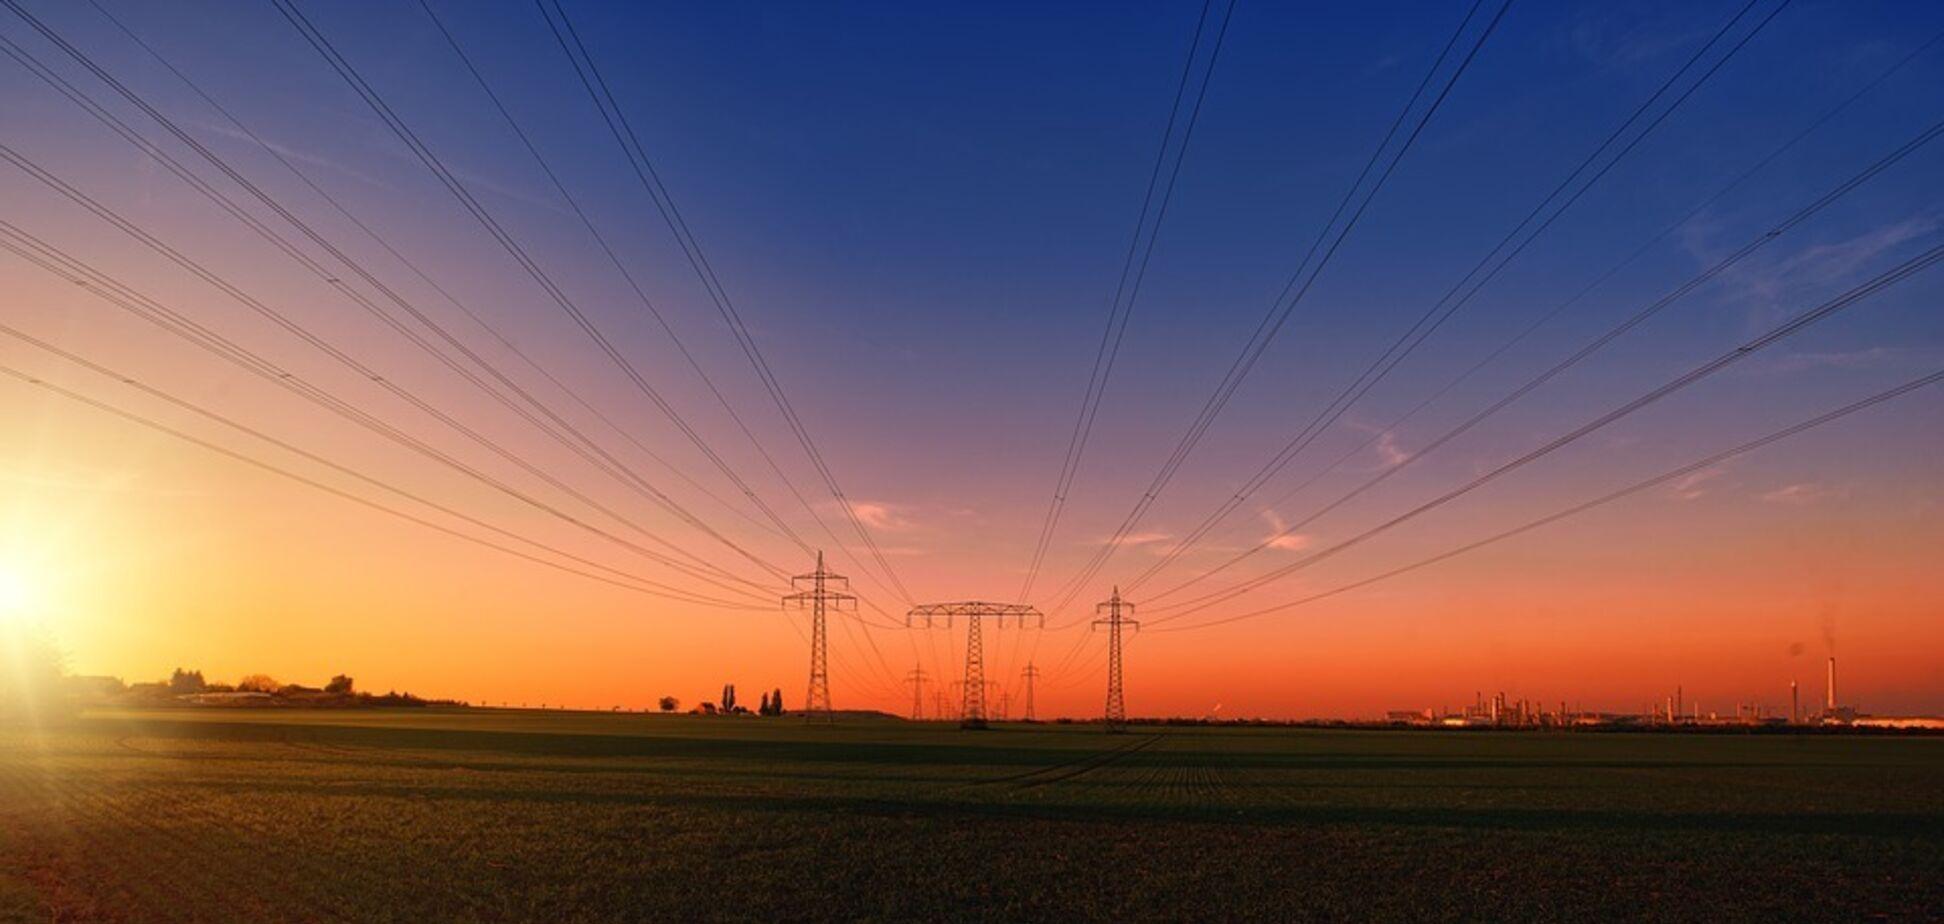 Как платить за электроэнергию меньше